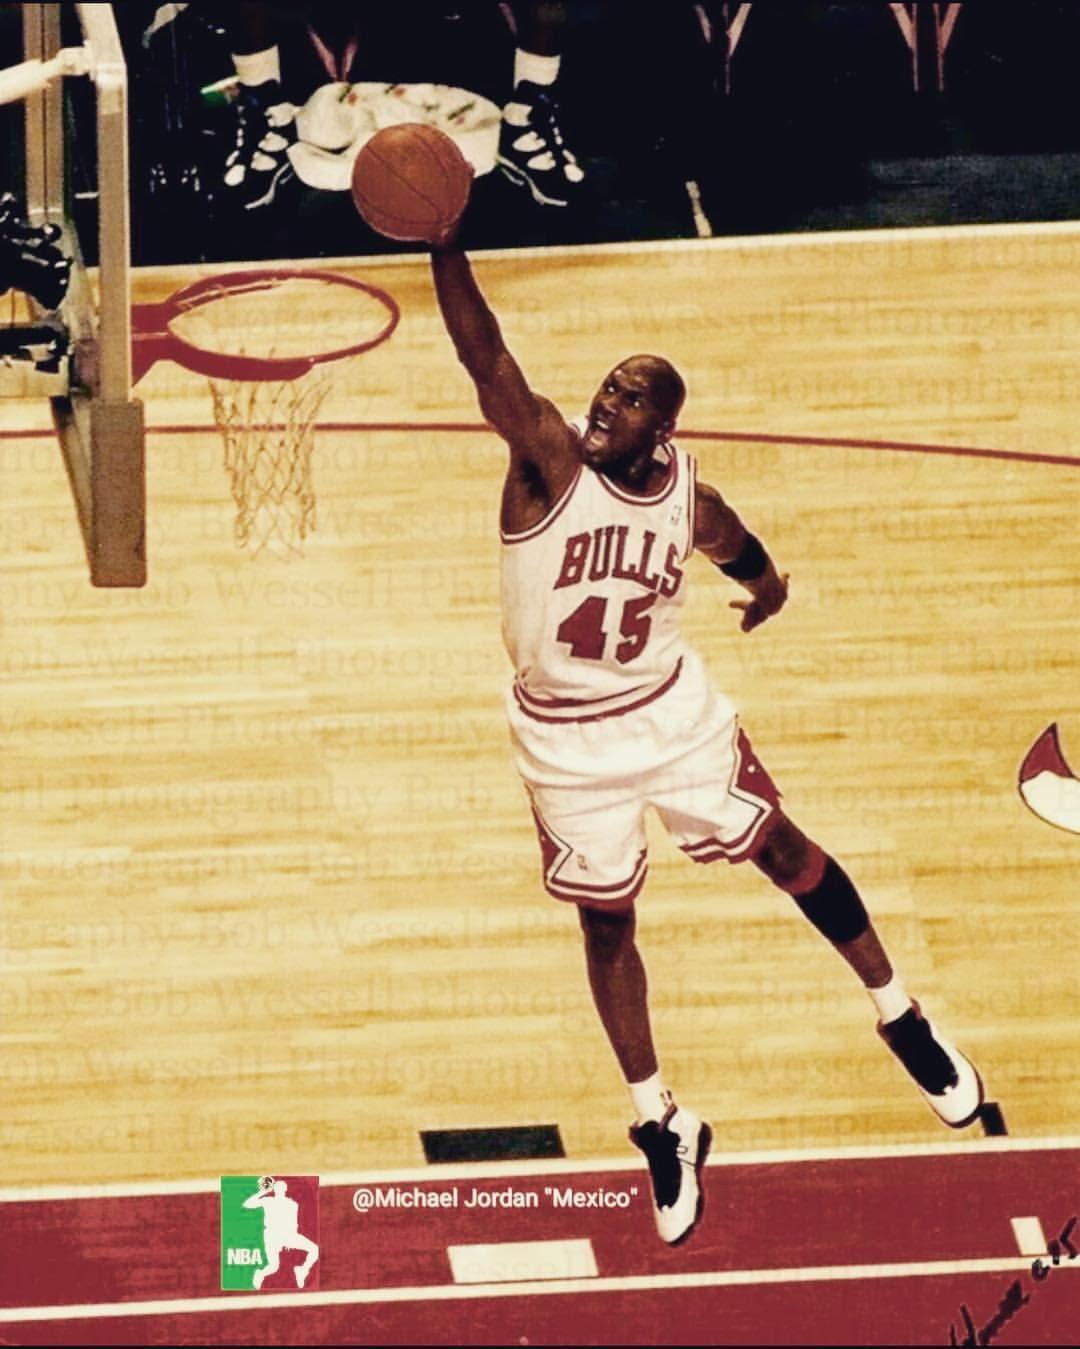 1 102 Likes 2 Comments Michael Jordan Michaelairjordans On Instagram Michaeljordan Michaelairjordan Air Michael Jordan Images Jordans Michael Jordan